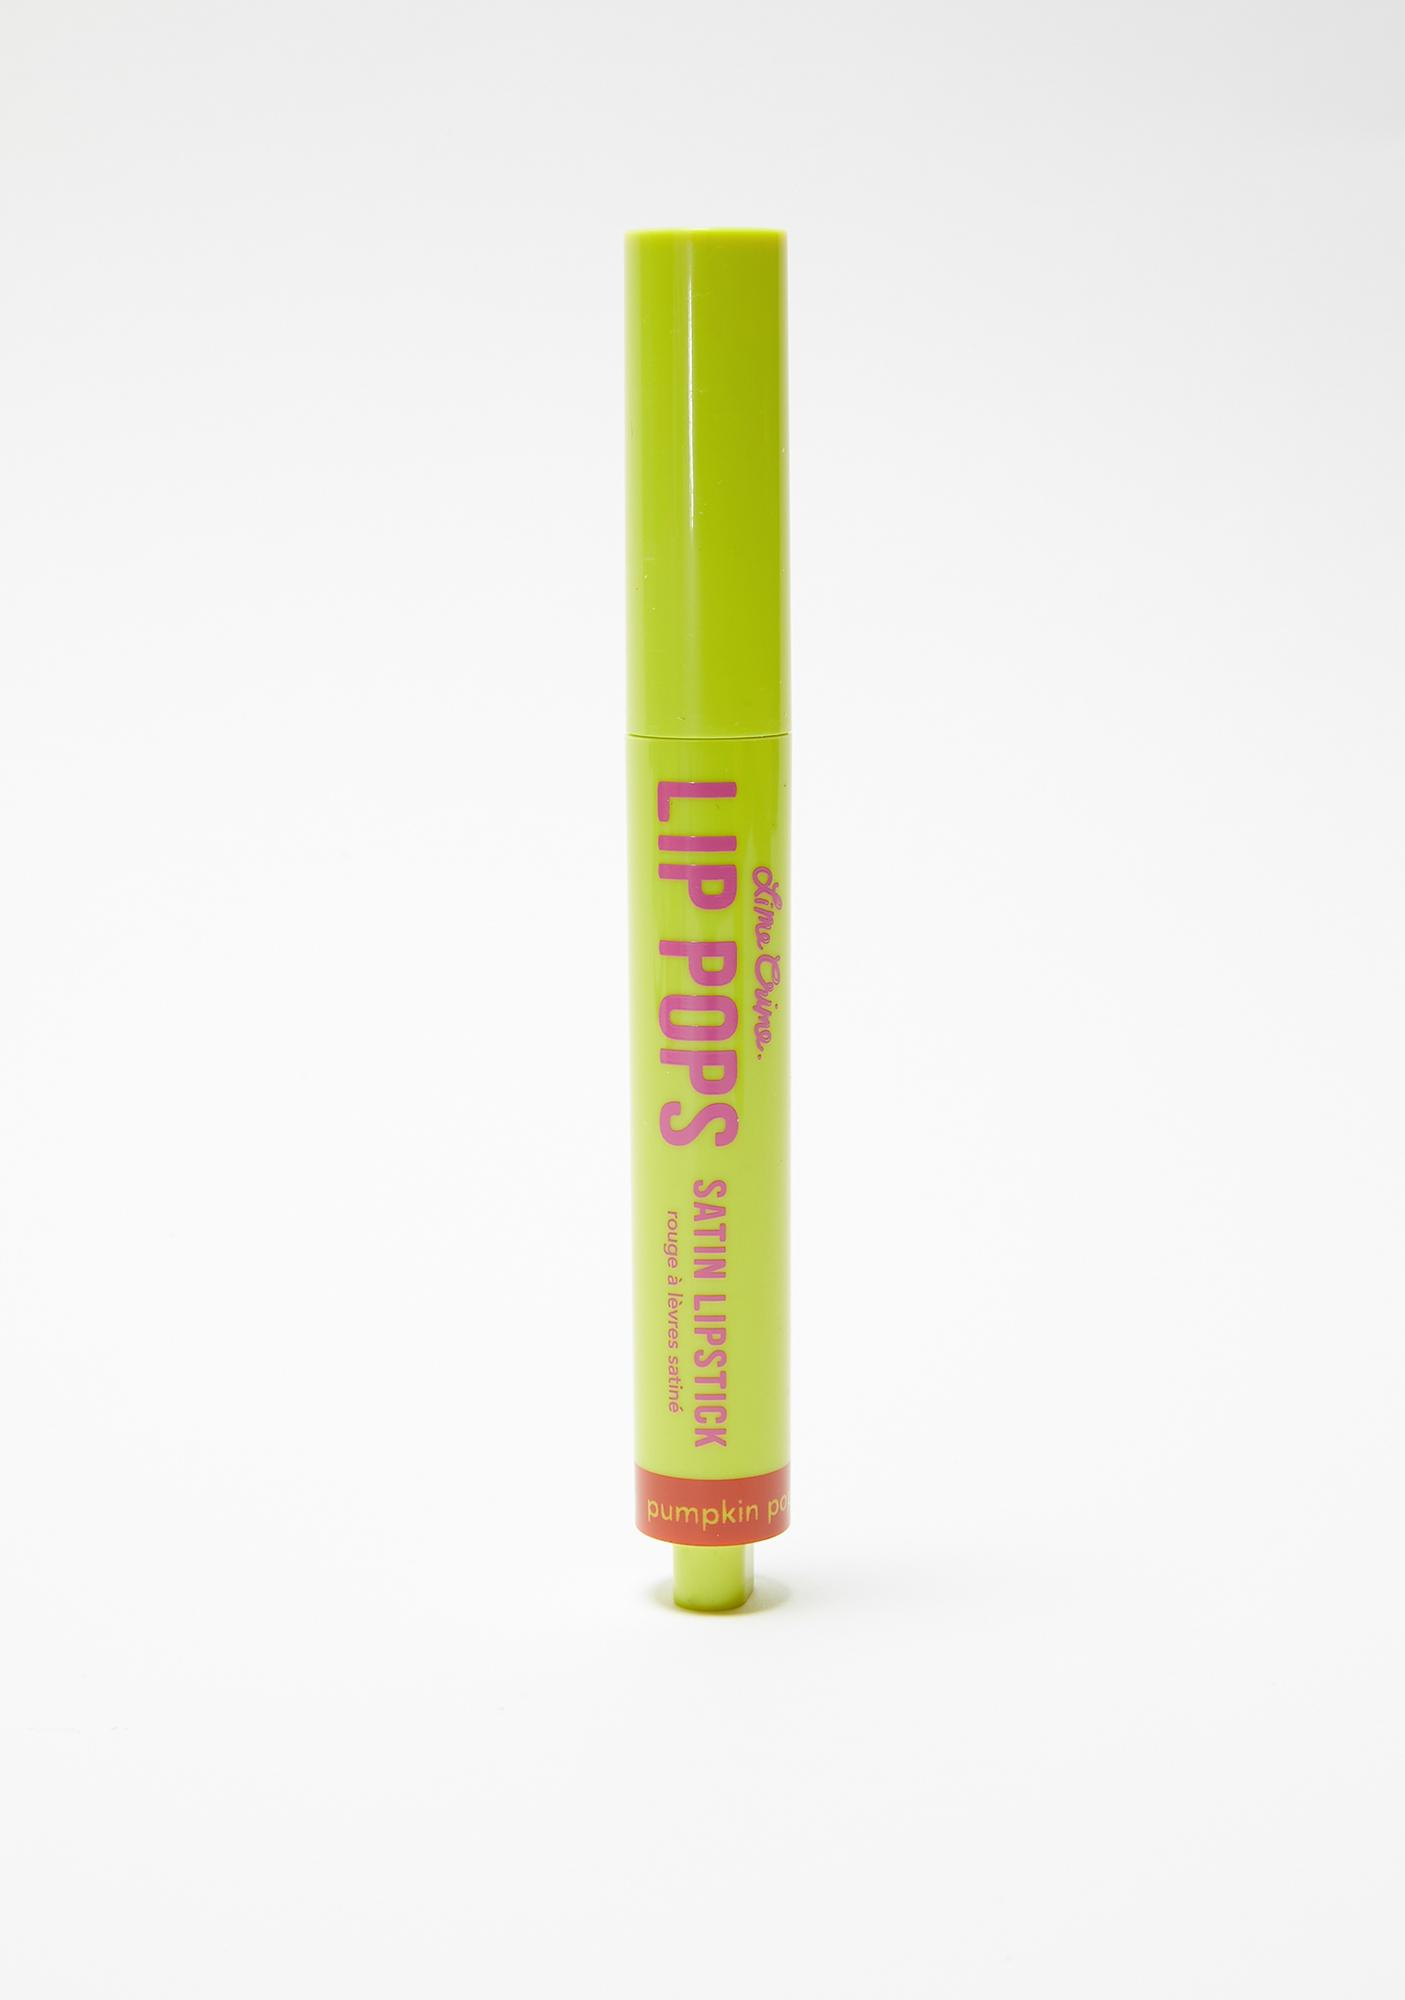 Lime Crime Pumpkin Pop Lip Pops Satin Lipstick